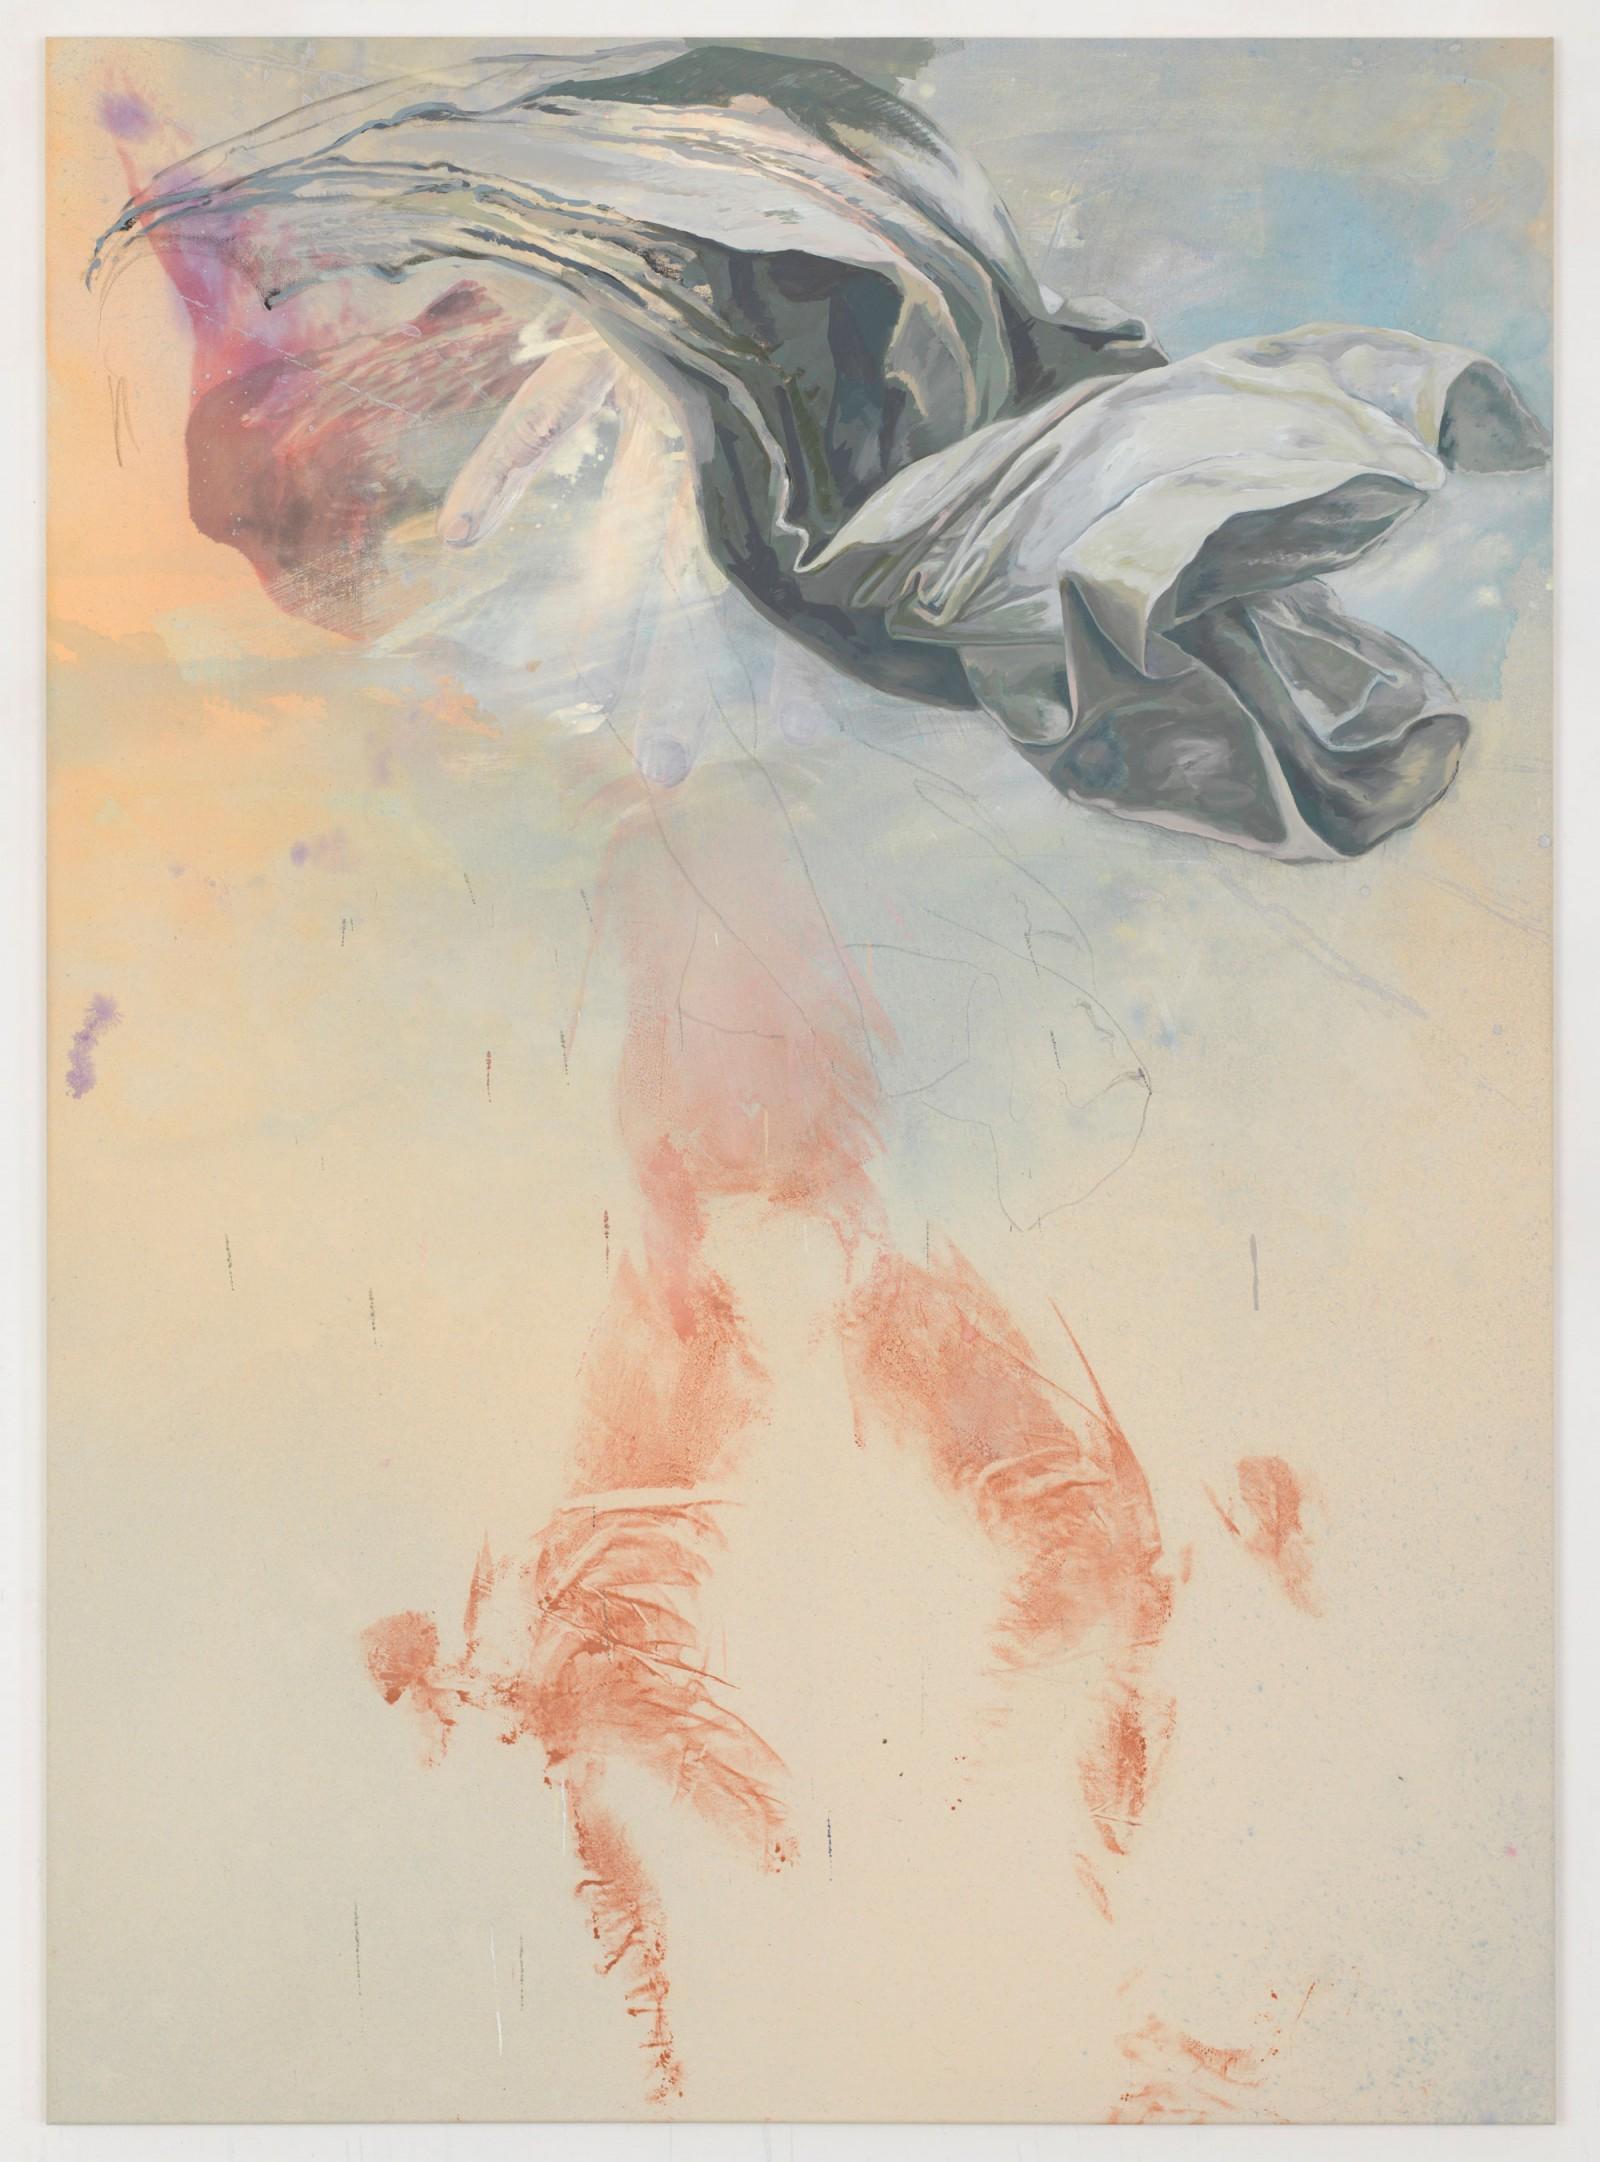 Kim Nekarda: untitled, 2016, vinyl color, pencil & body print on cotton, 180 x 130 cm